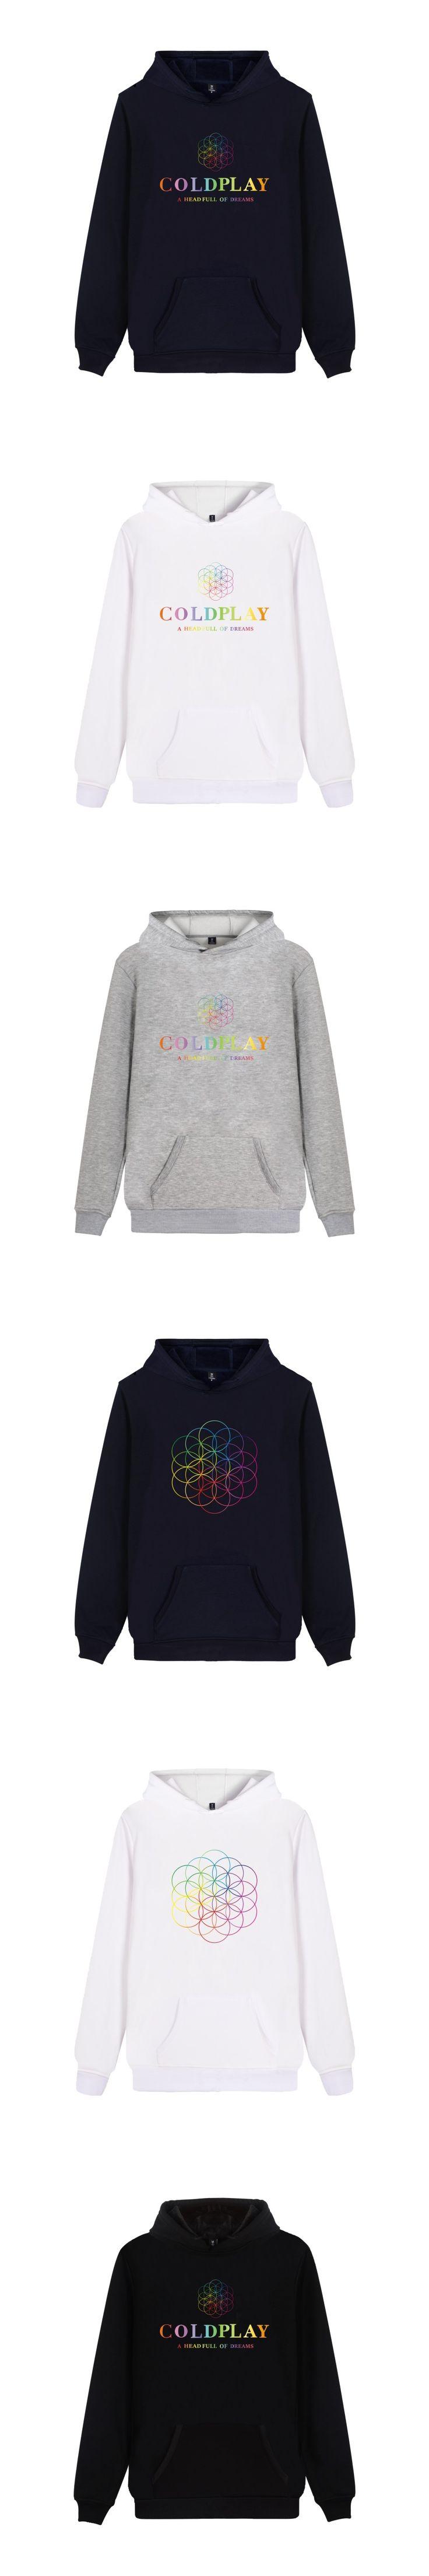 ALIZAZA Fashion Rock Band Mens Hoodies Coldplay Print Unisex Pullover Sweatershirt Autumn Winter Hip Hop Coldplay Band Clothing